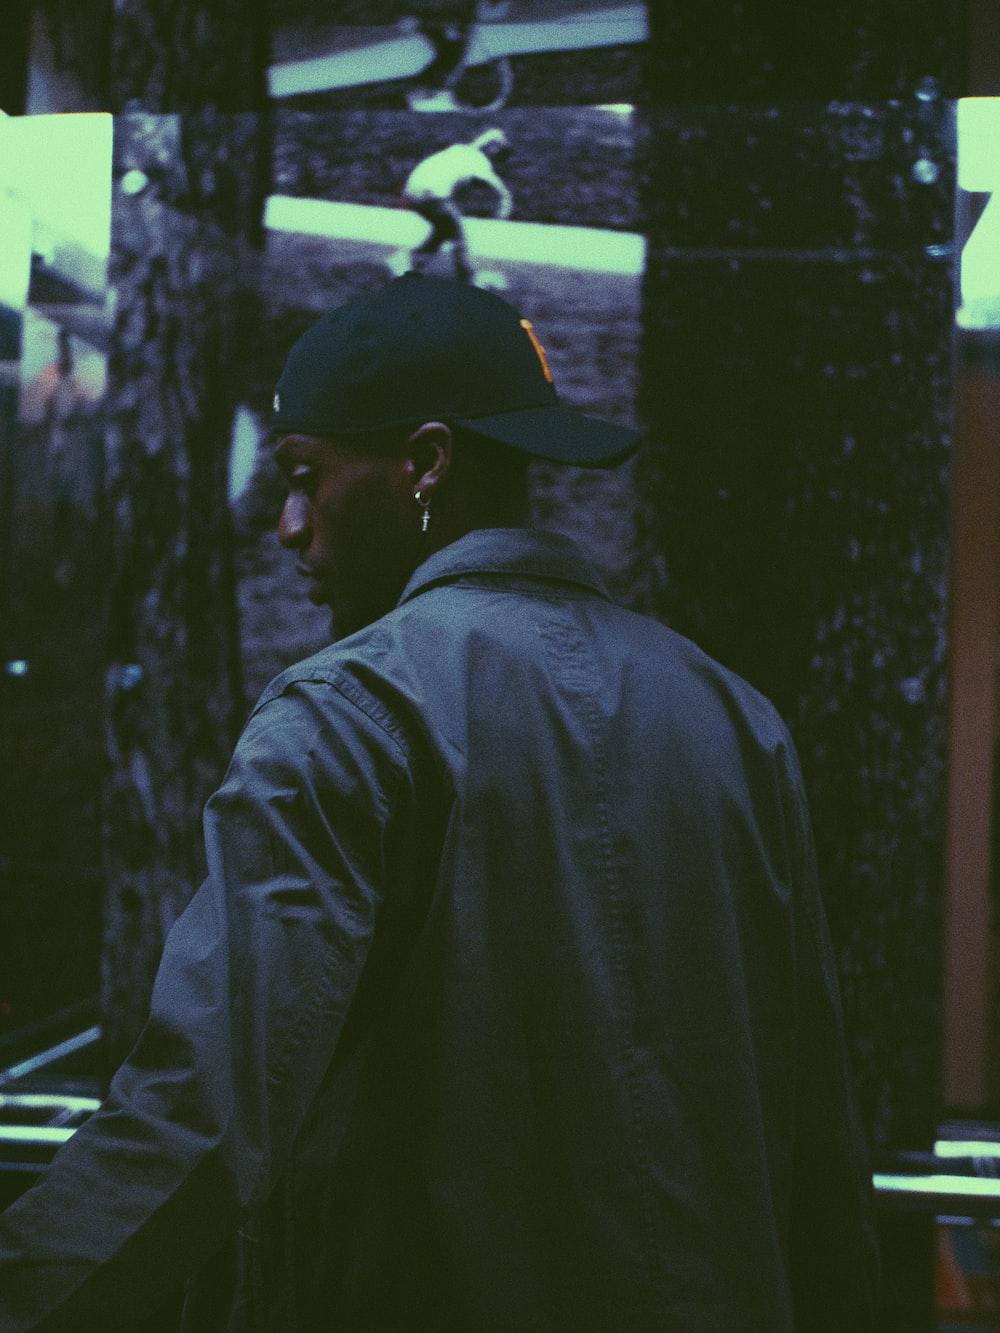 man in black hat and black jacket